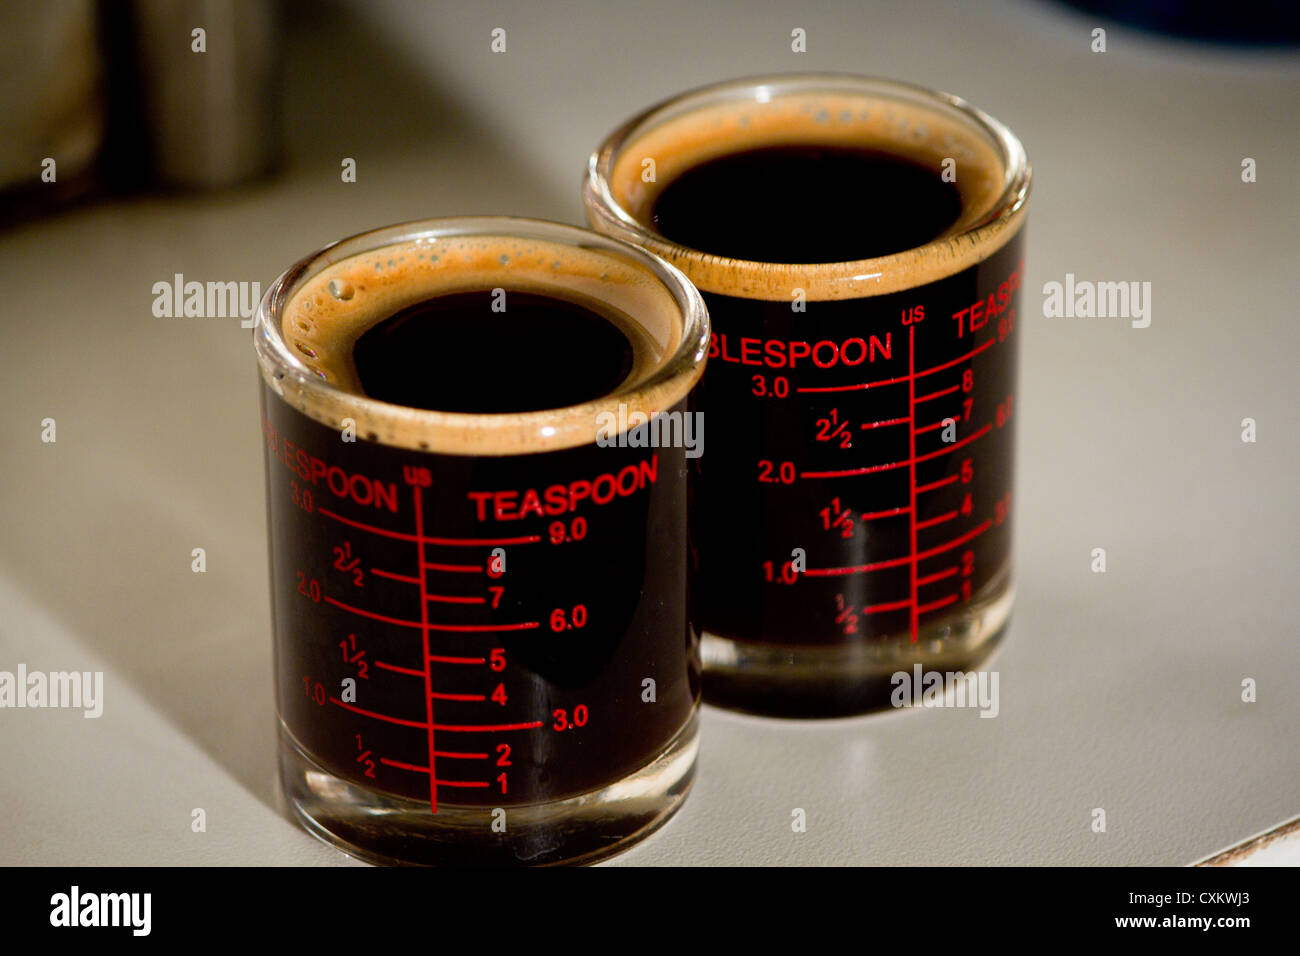 espresso black double shot so good smell - Stock Image